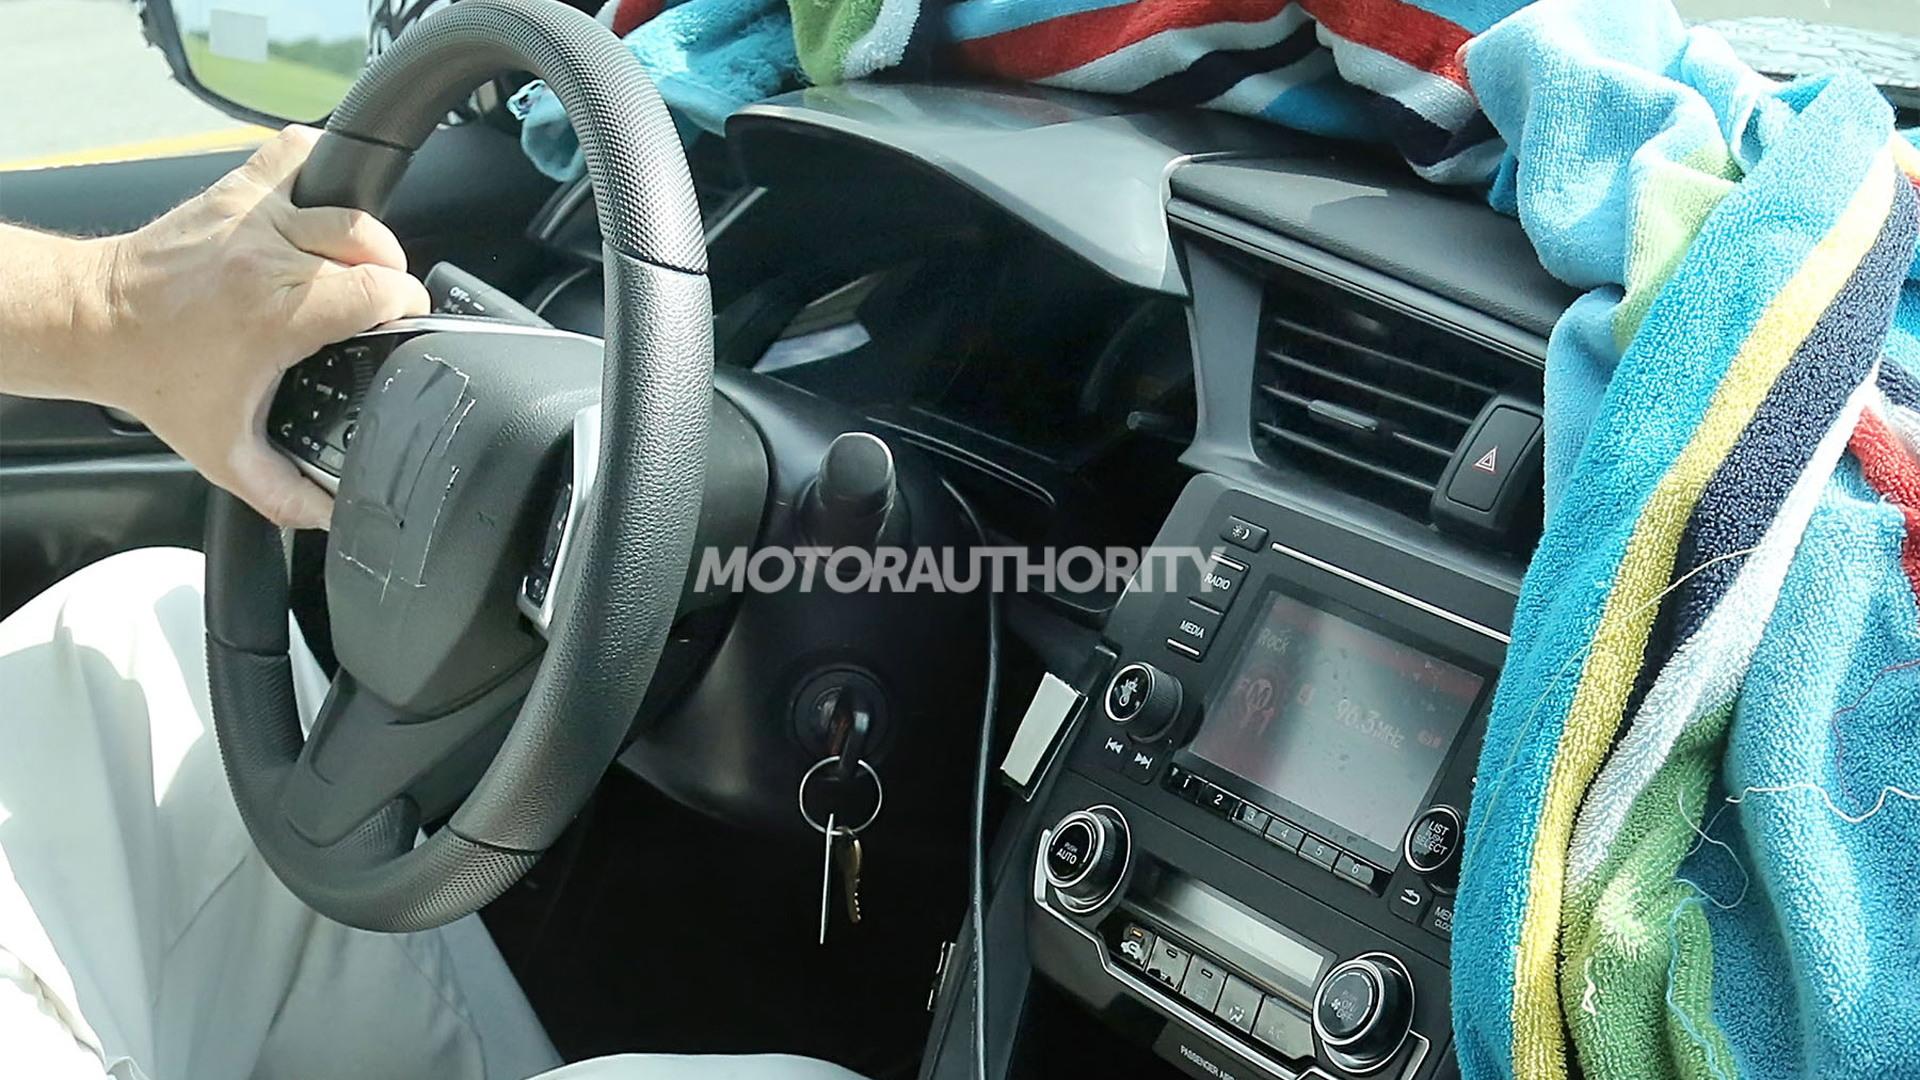 2016 Honda Civic spy shots - Image via S. Baldauf/SB-Medien